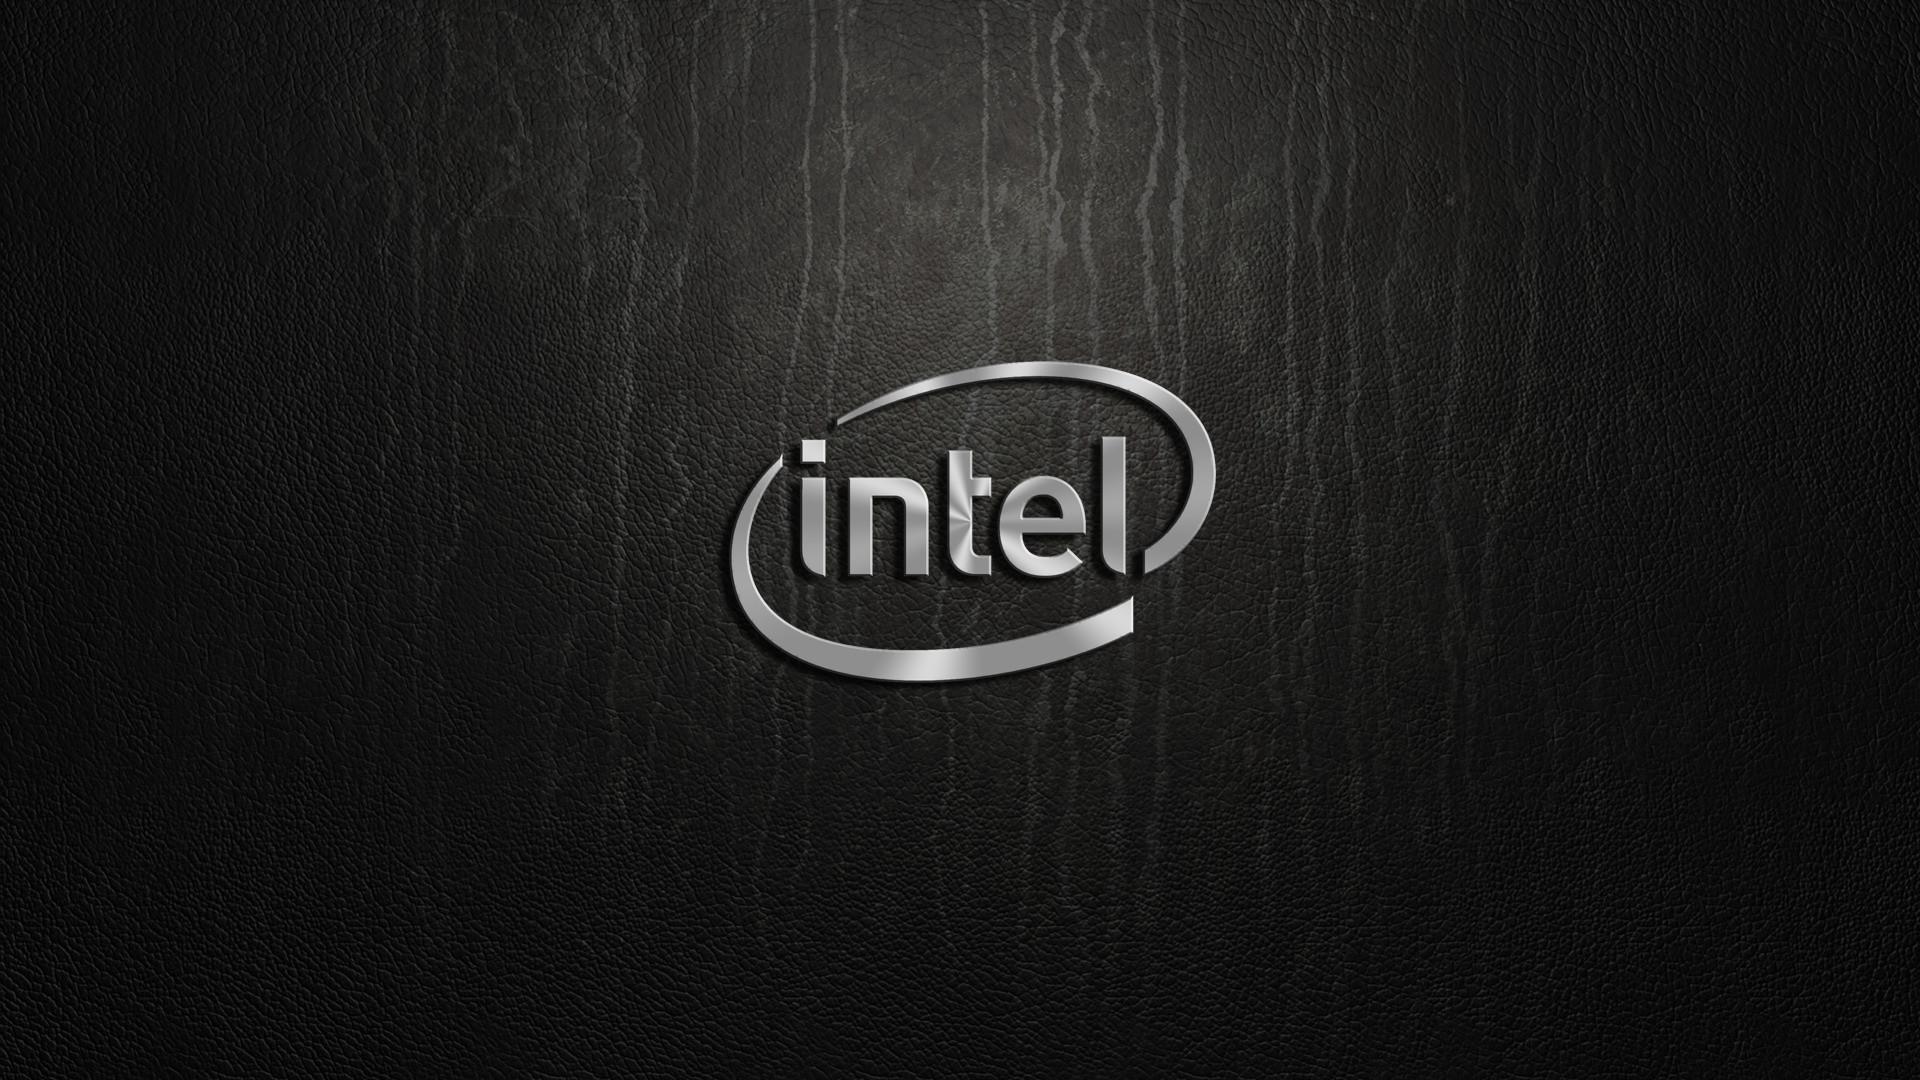 Intel Announces Q4 2016 and Full Year Revenues   Record Q4 YOY 1920x1080